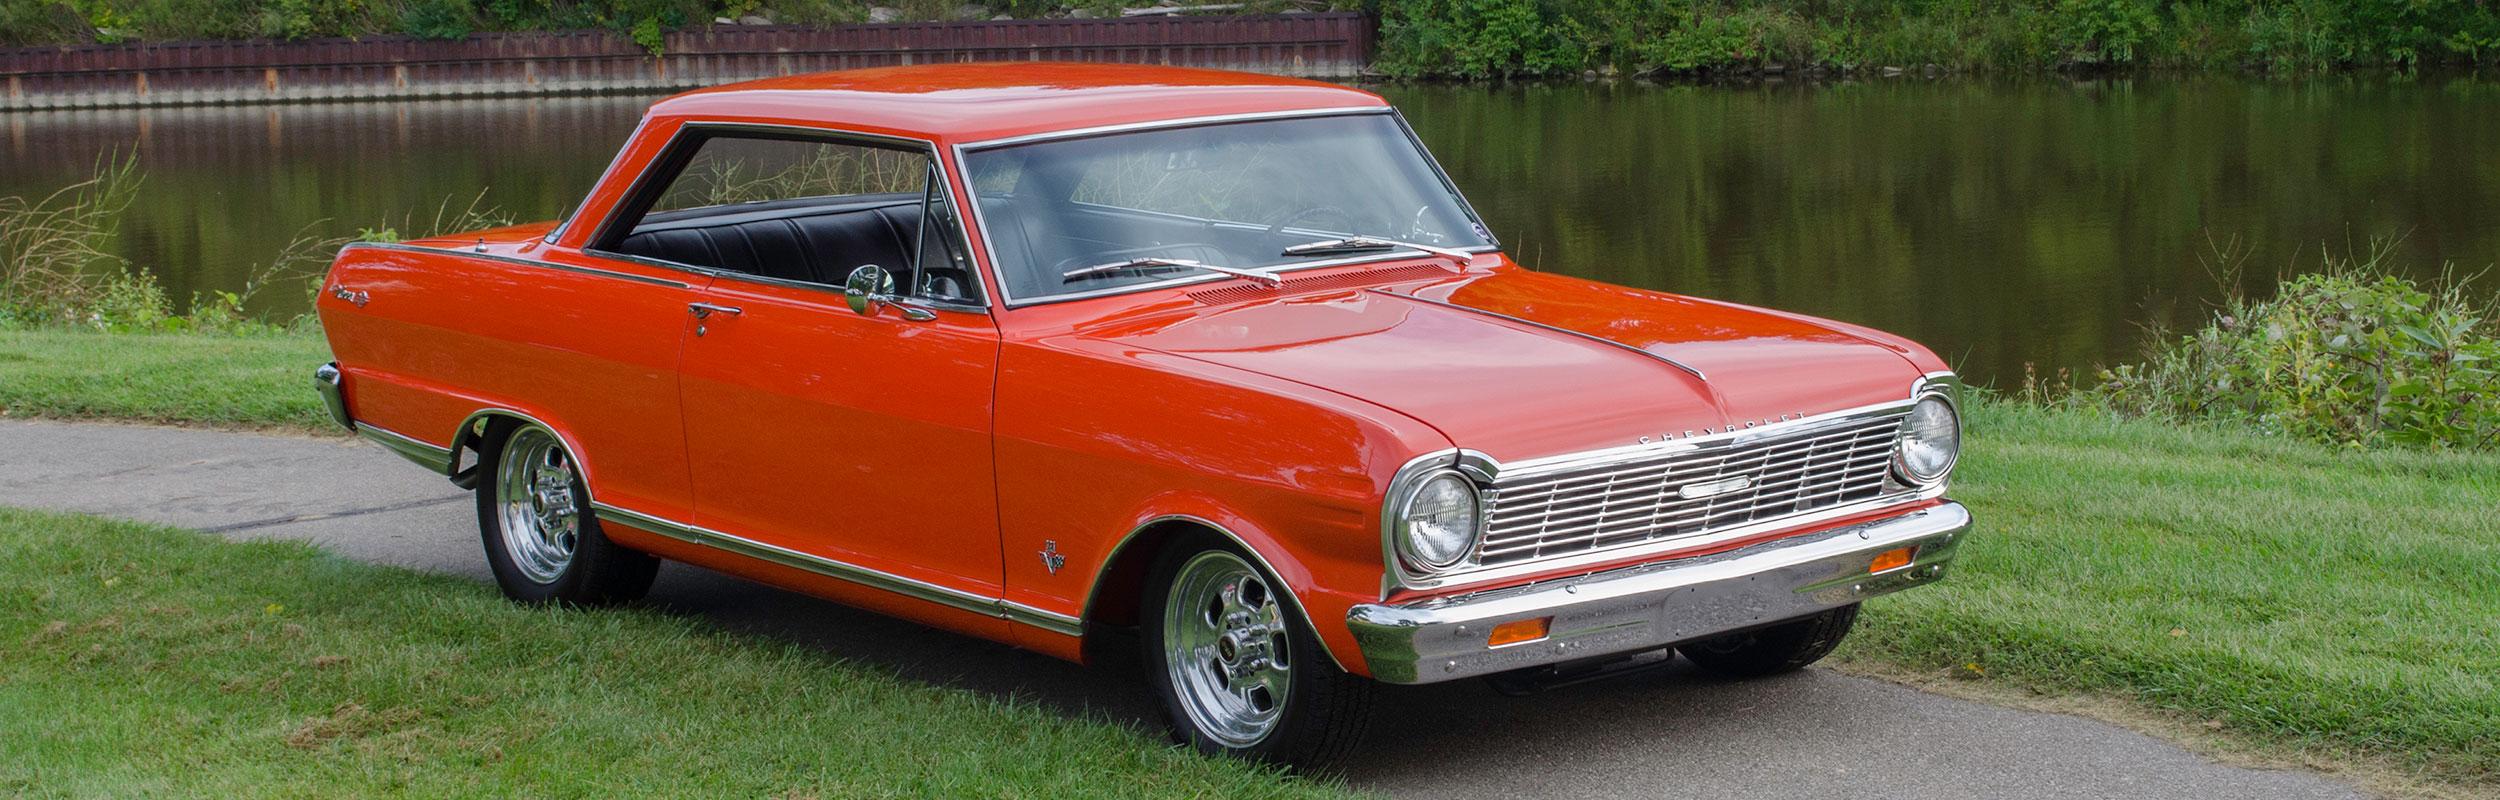 1963-1979 Nova